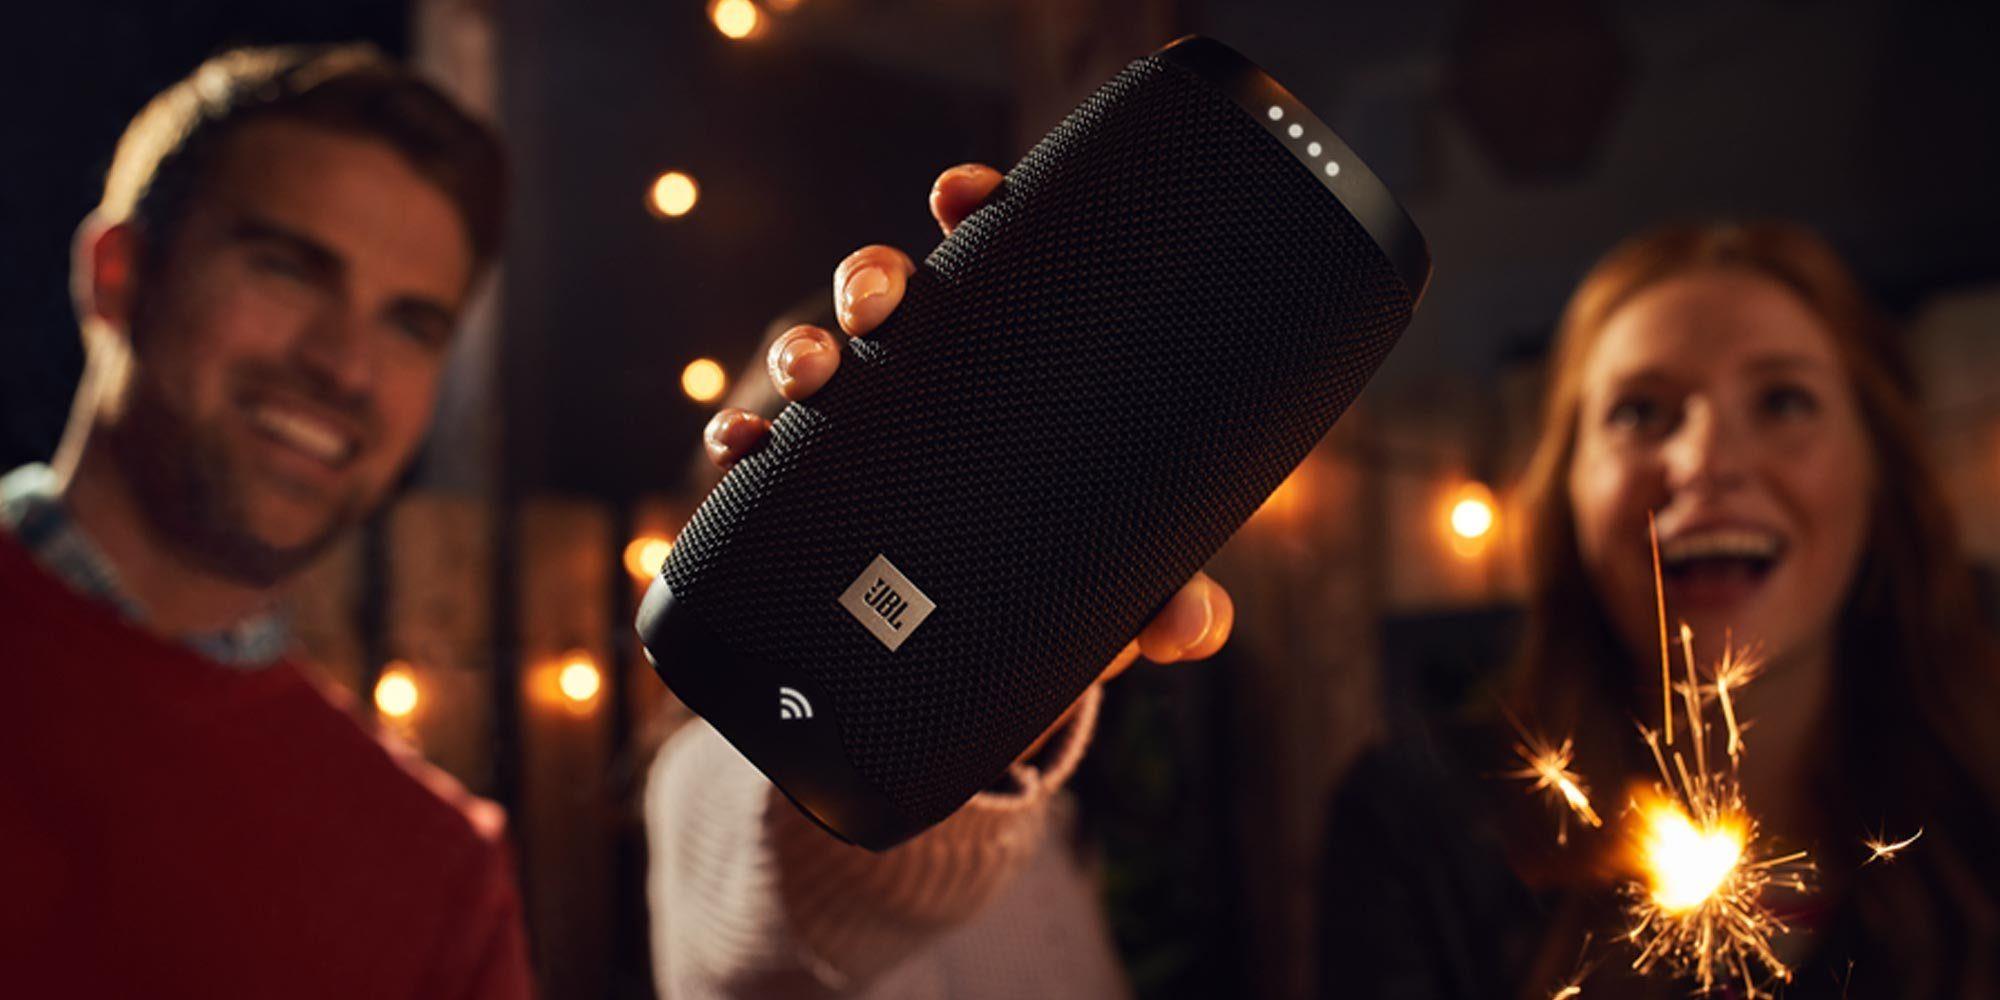 9to5Toys Letzter Anruf: Google Chromecast Ultra ab 35 $, Nokia Steel HR 140 $, Anker 3-in-1-USB-C-Kabel 11 $, mehr